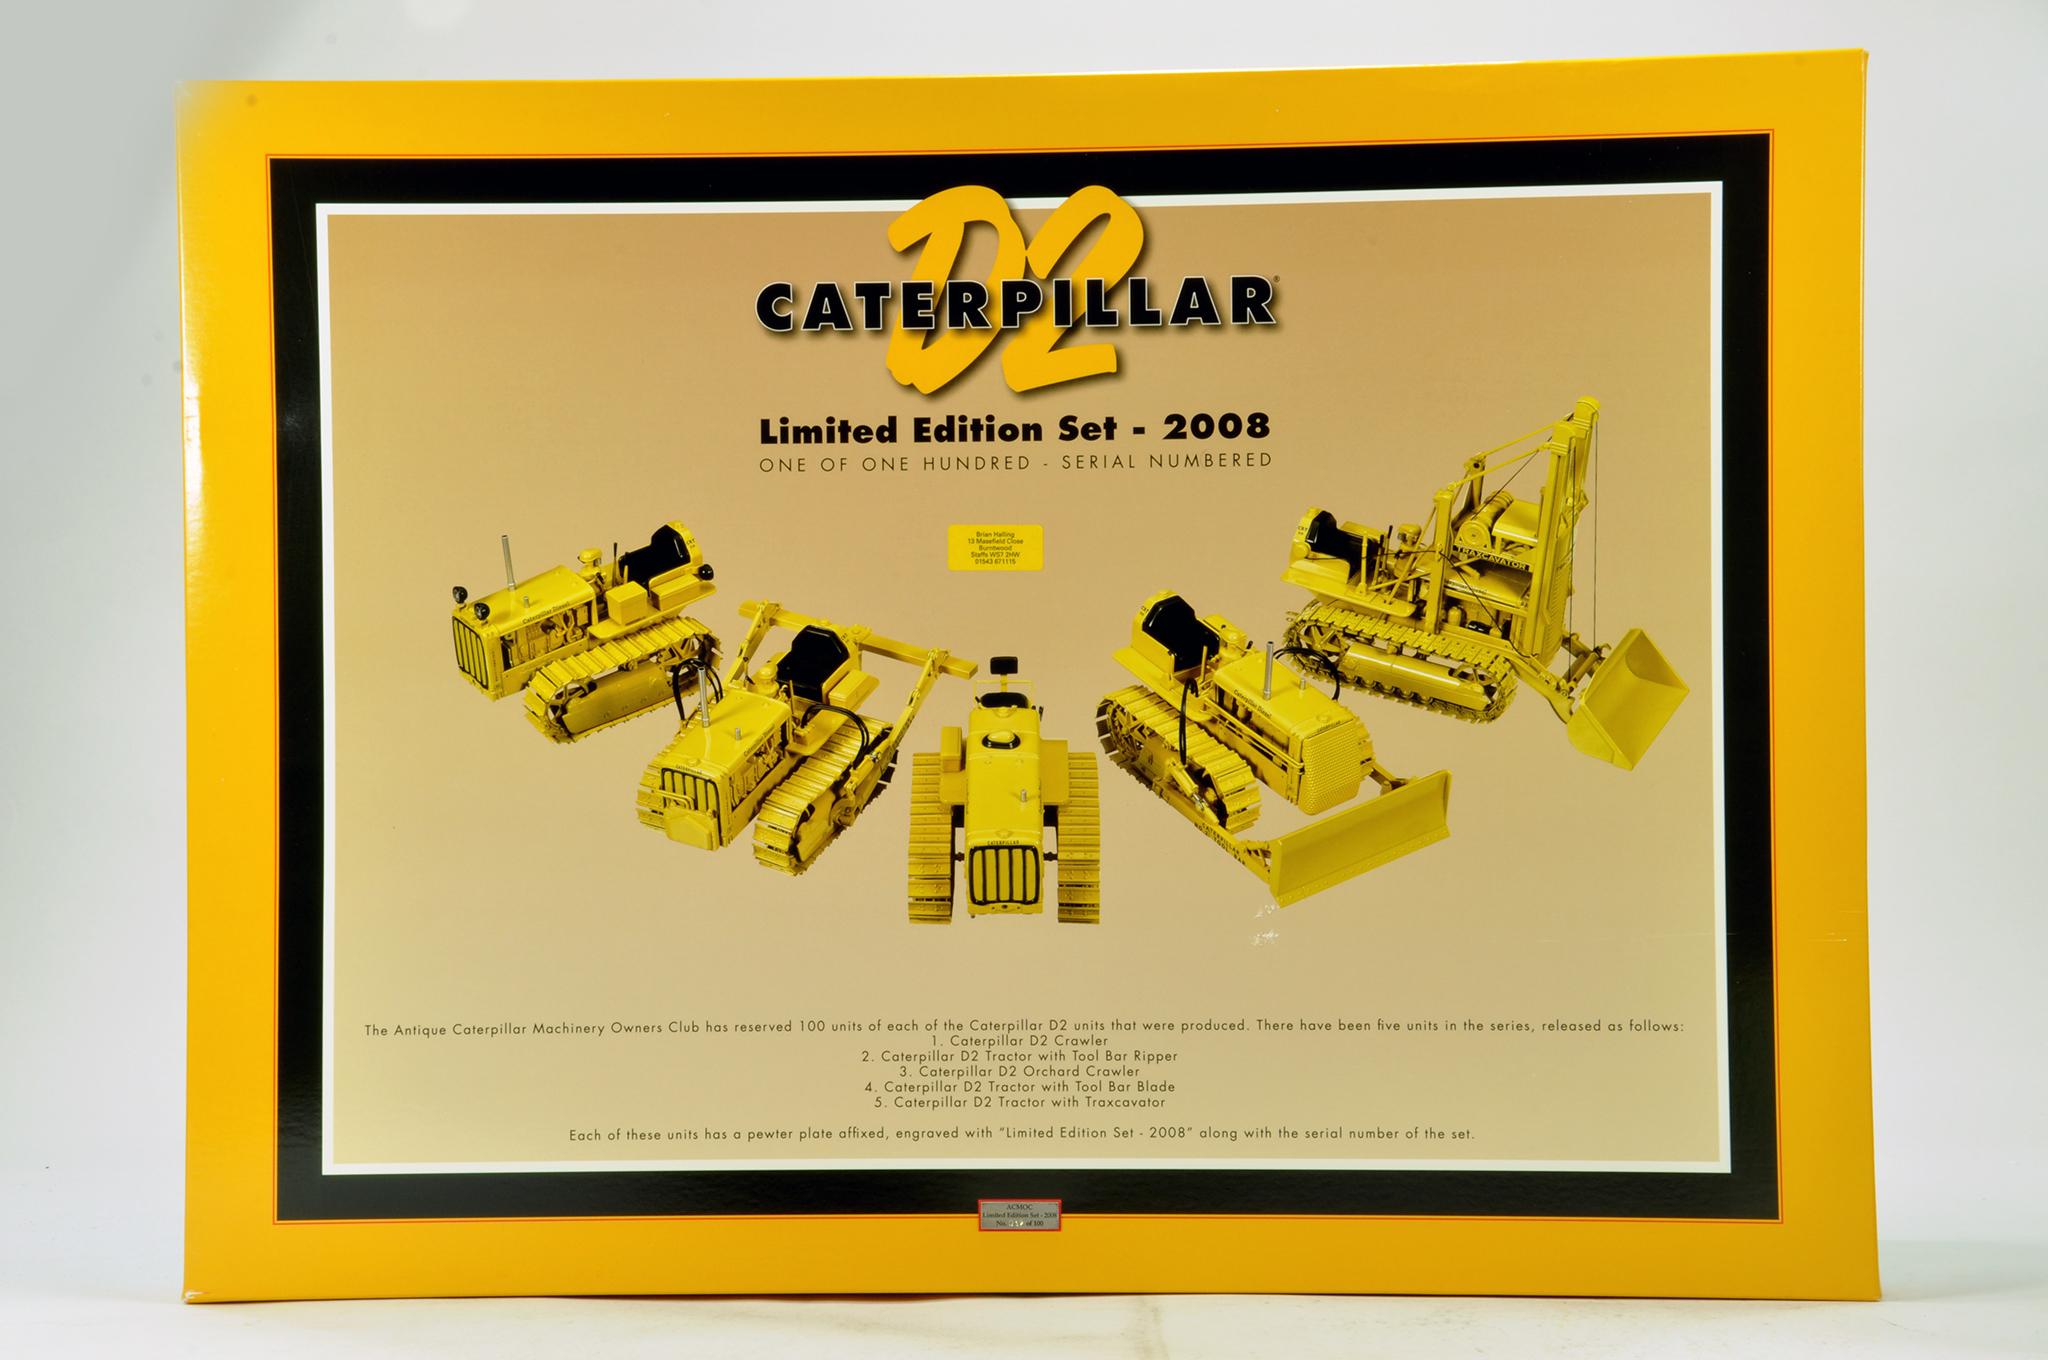 Lot 547 - Spec Cast 1/16 ACMOC 2008 Limited Edition Presentation Set for CAT Caterpillar D2 comprising 5